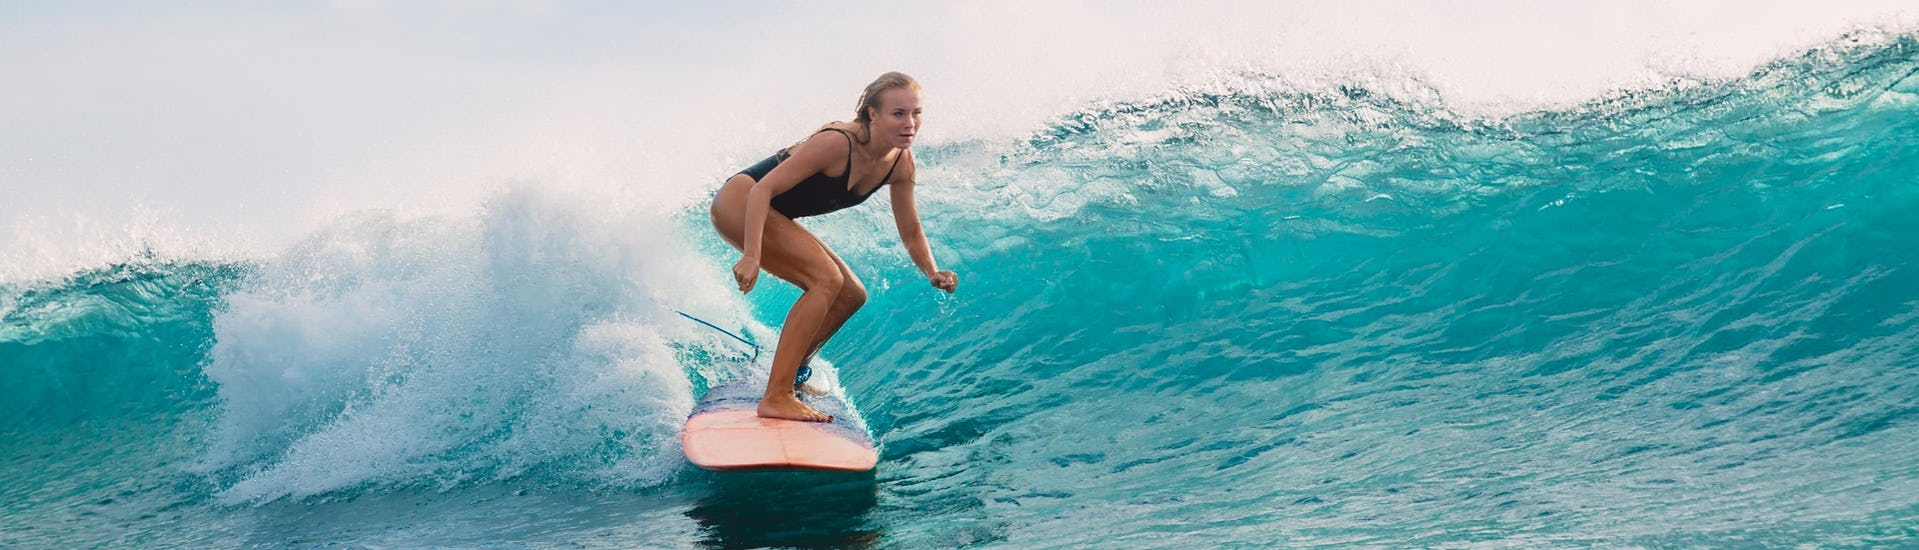 surfing-SEM-Hero1